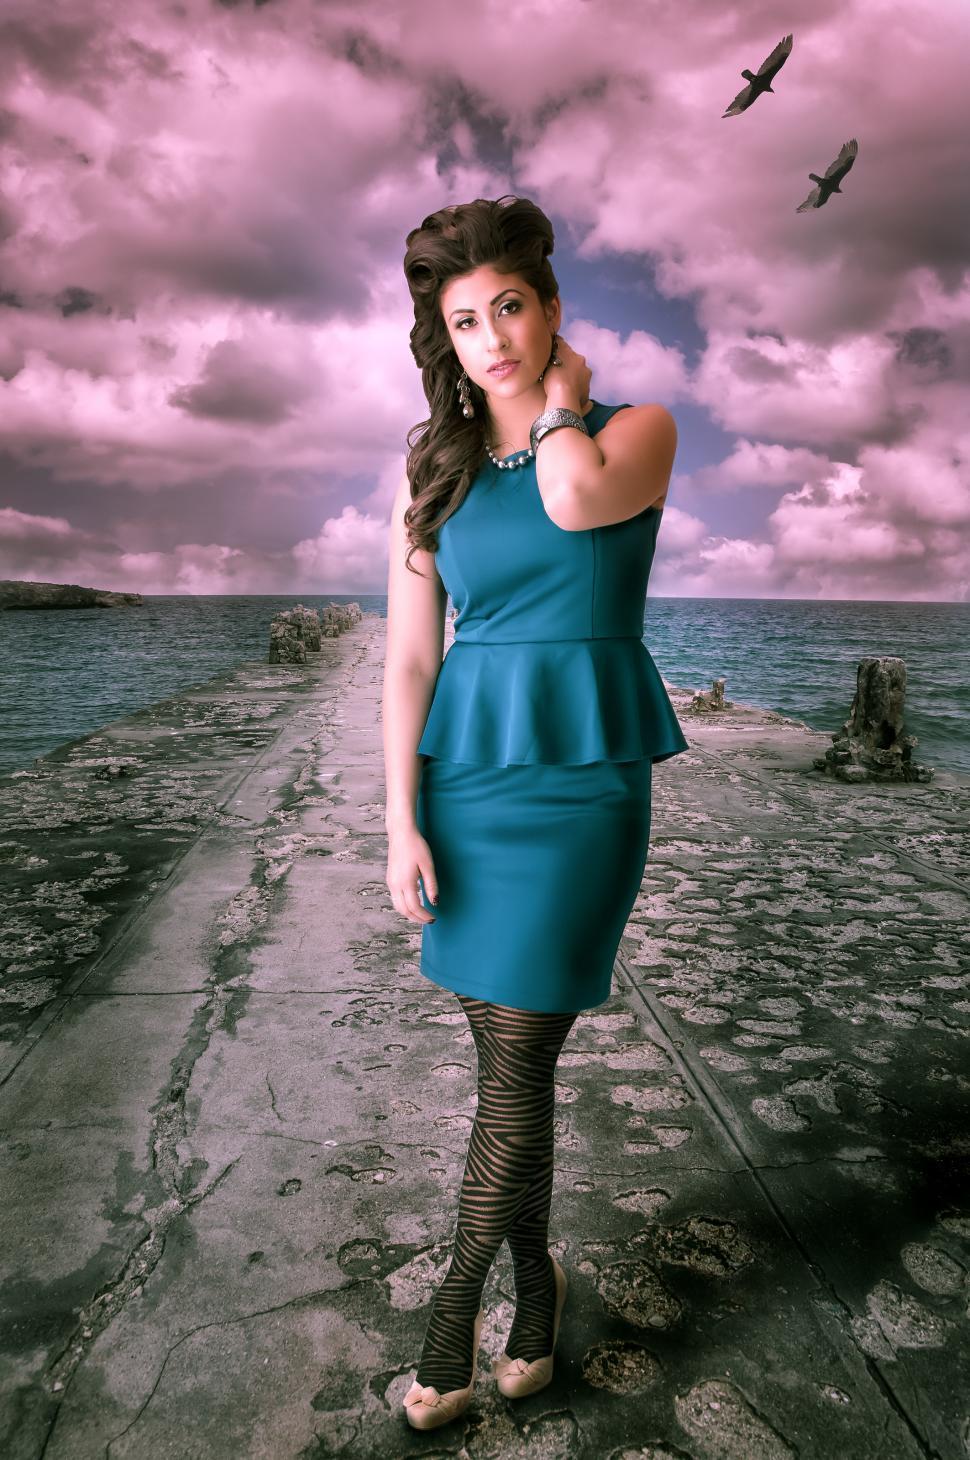 Download Free Stock HD Photo of Brunette in blue dress Online